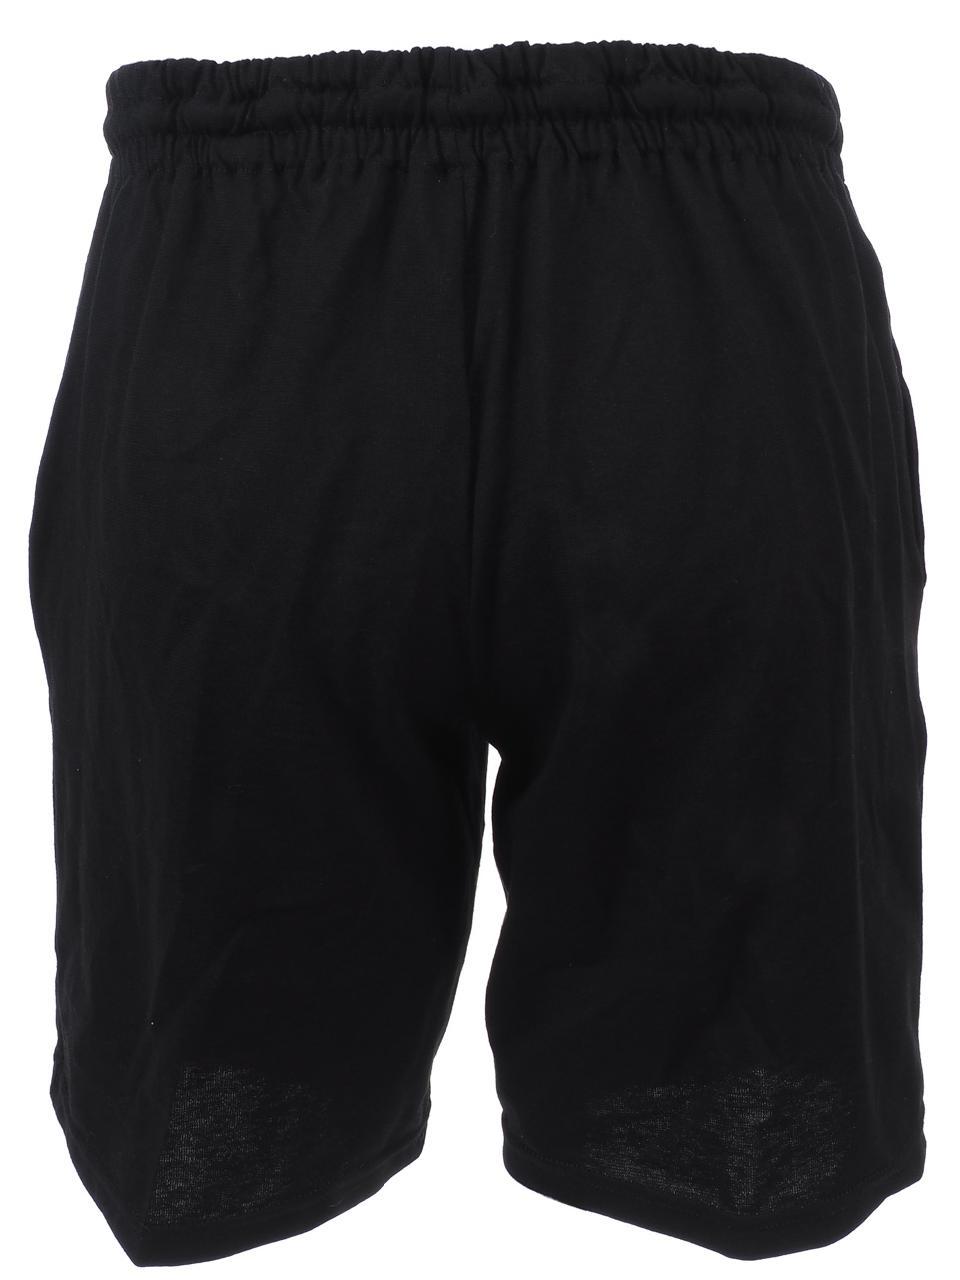 Shorts-Multi-Panzeri-Park-B-Nr-B-B-R-Bermuda-Black-22071-New thumbnail 5